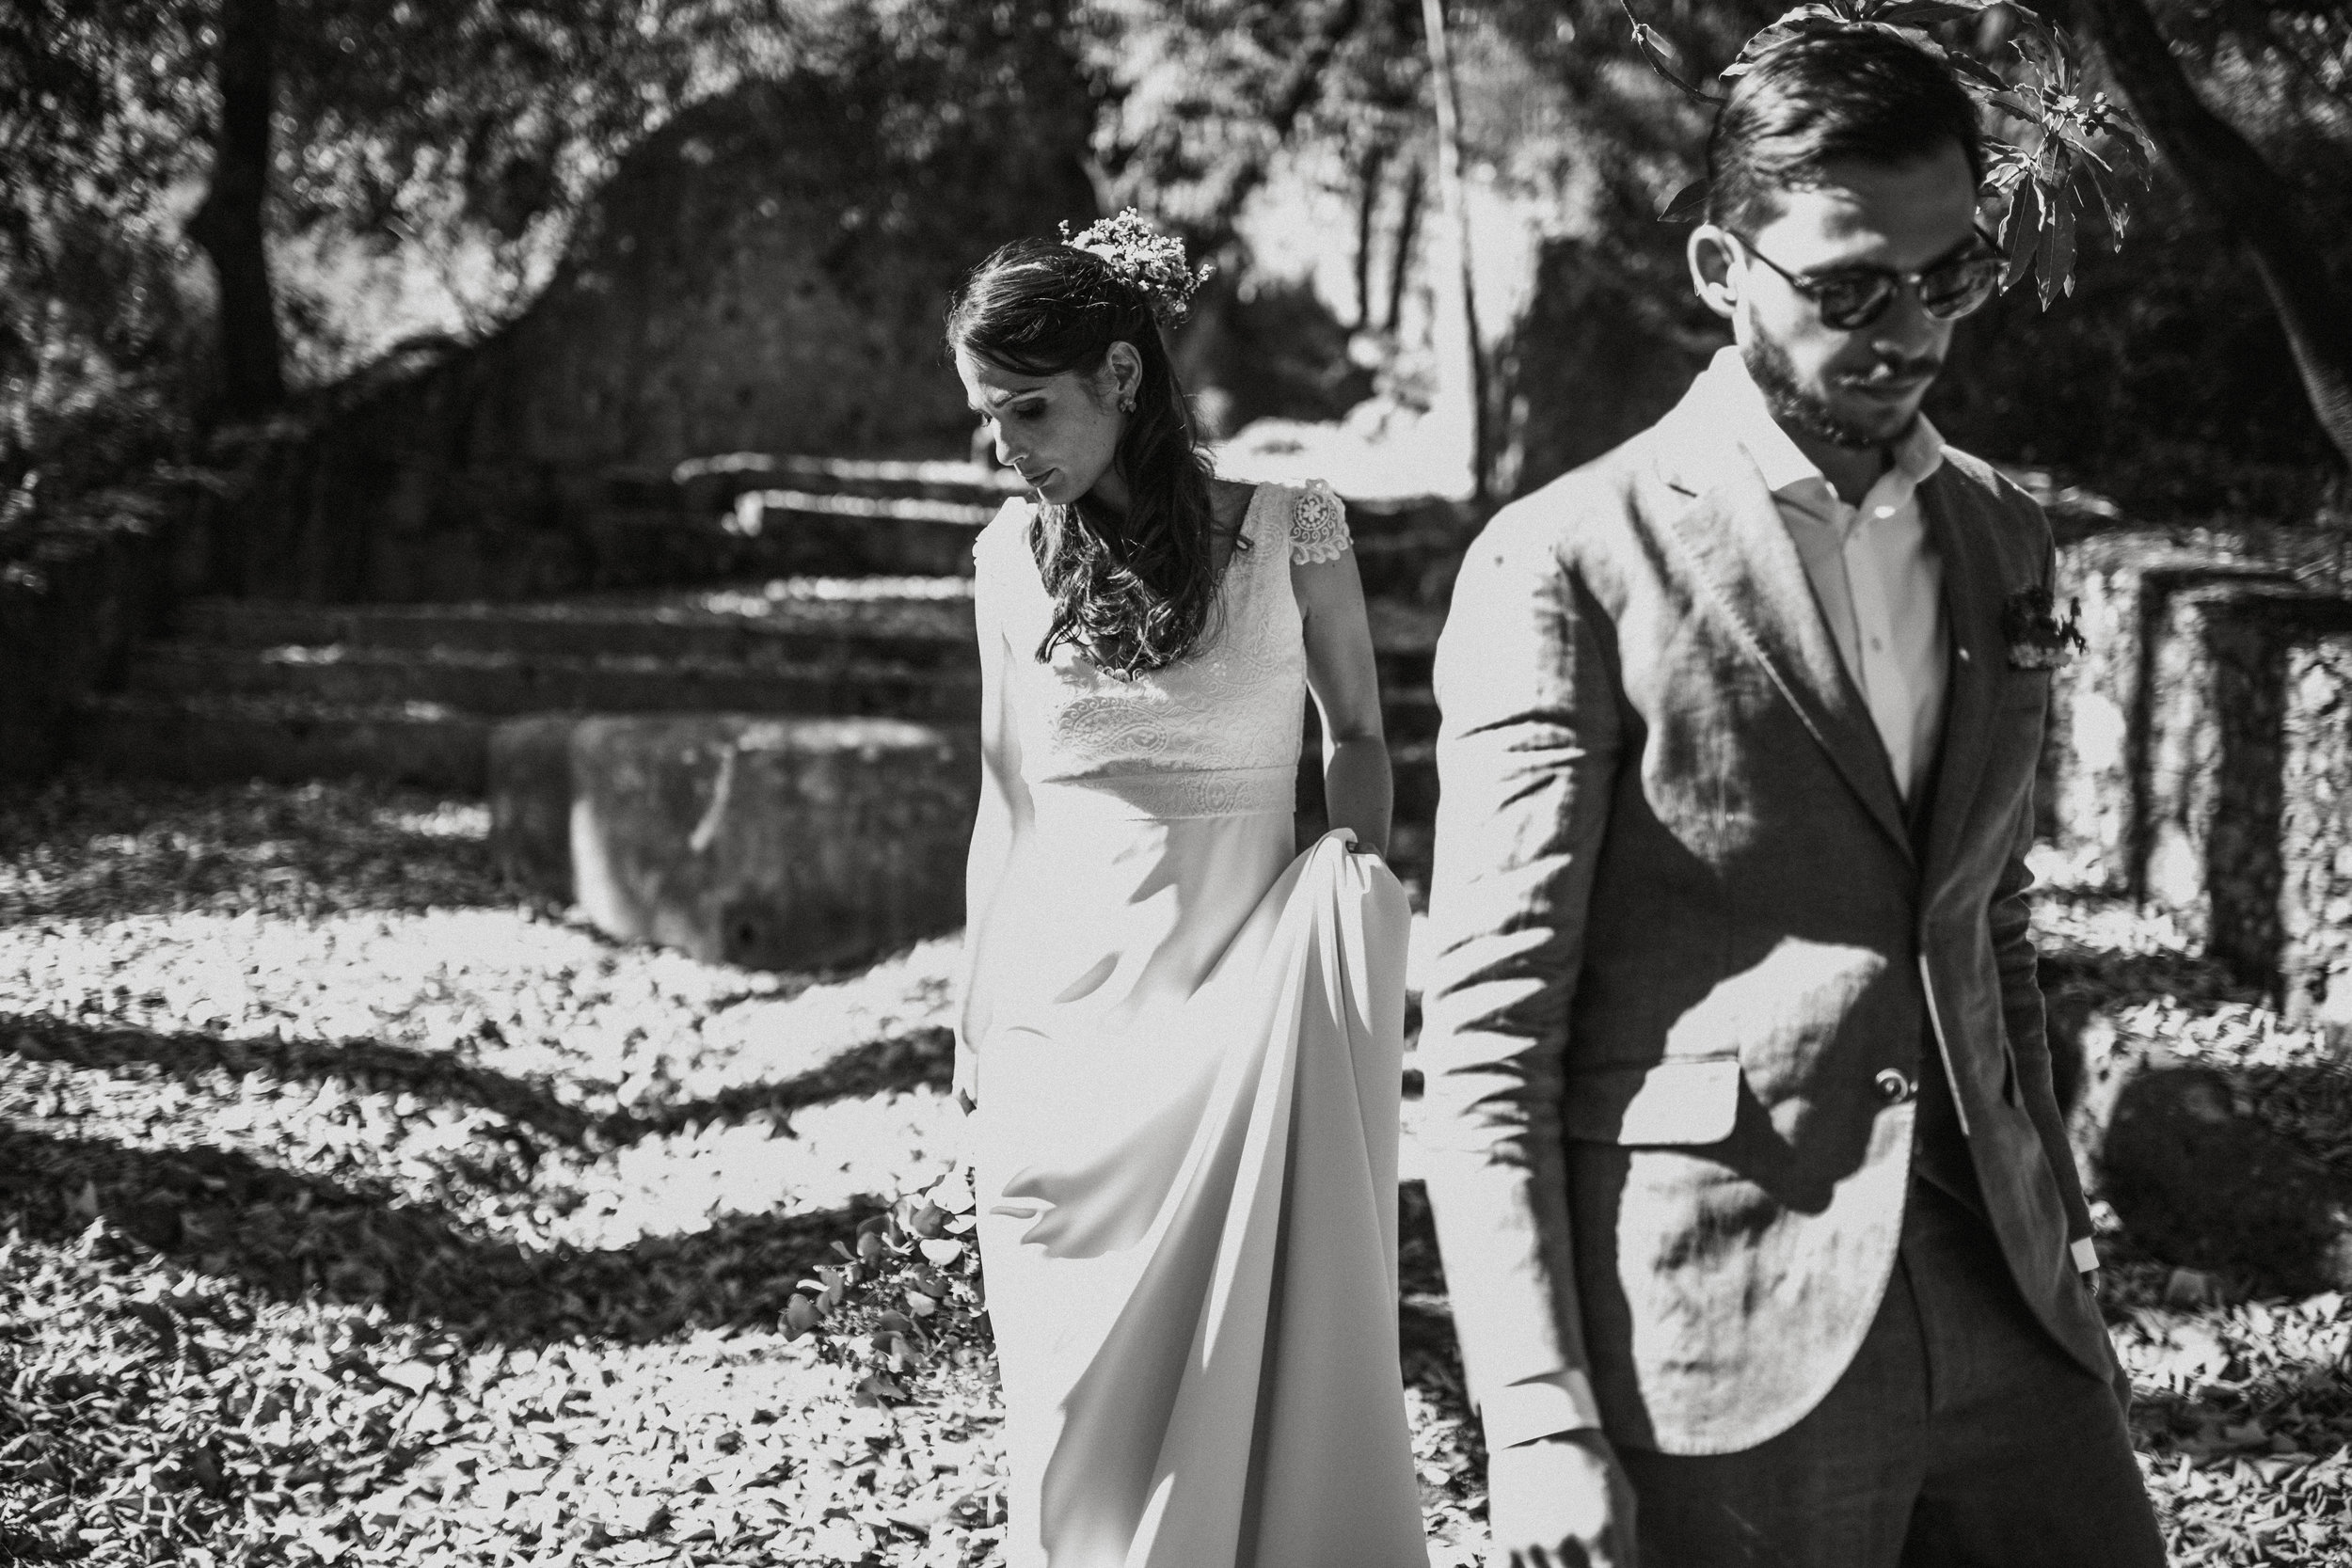 J&P 512_ 02 setembro 2017 Wedding day_.jpg